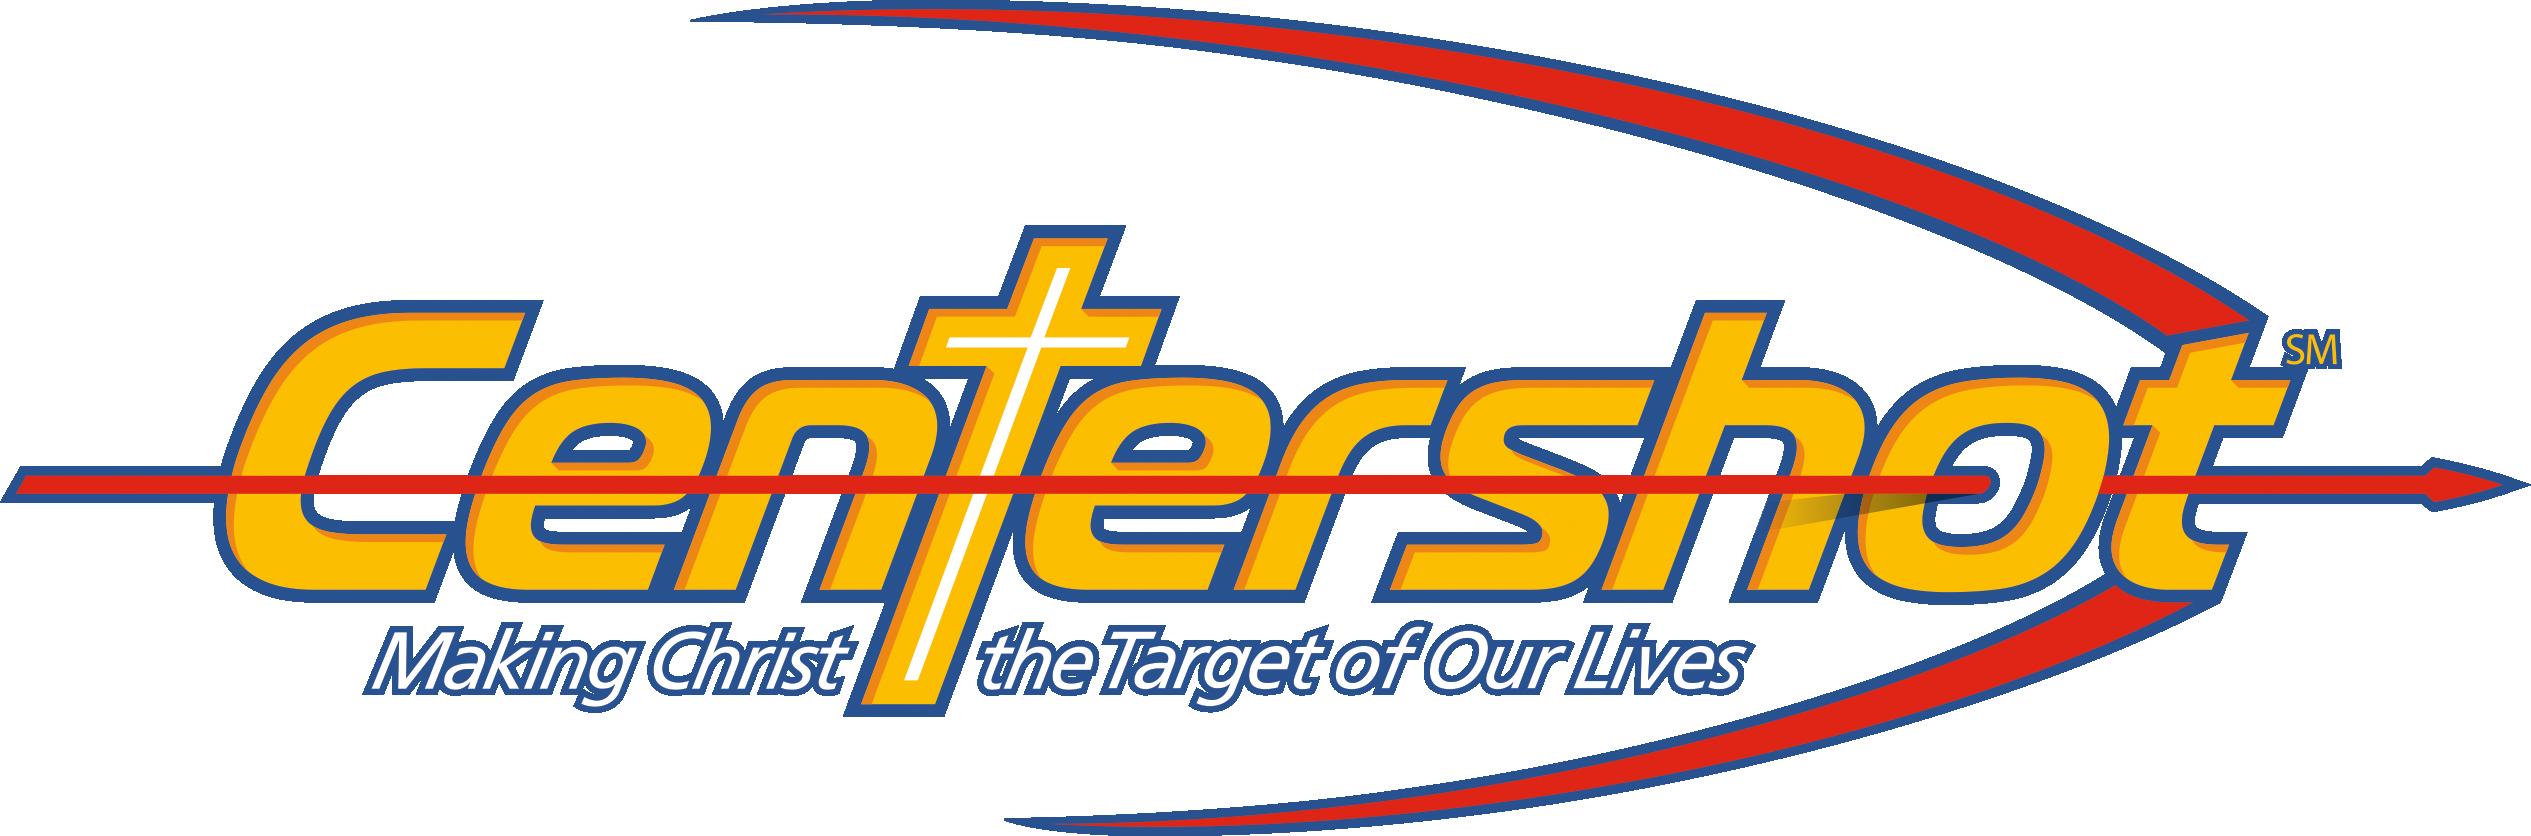 Centershot Archery Fall 2021 Registration